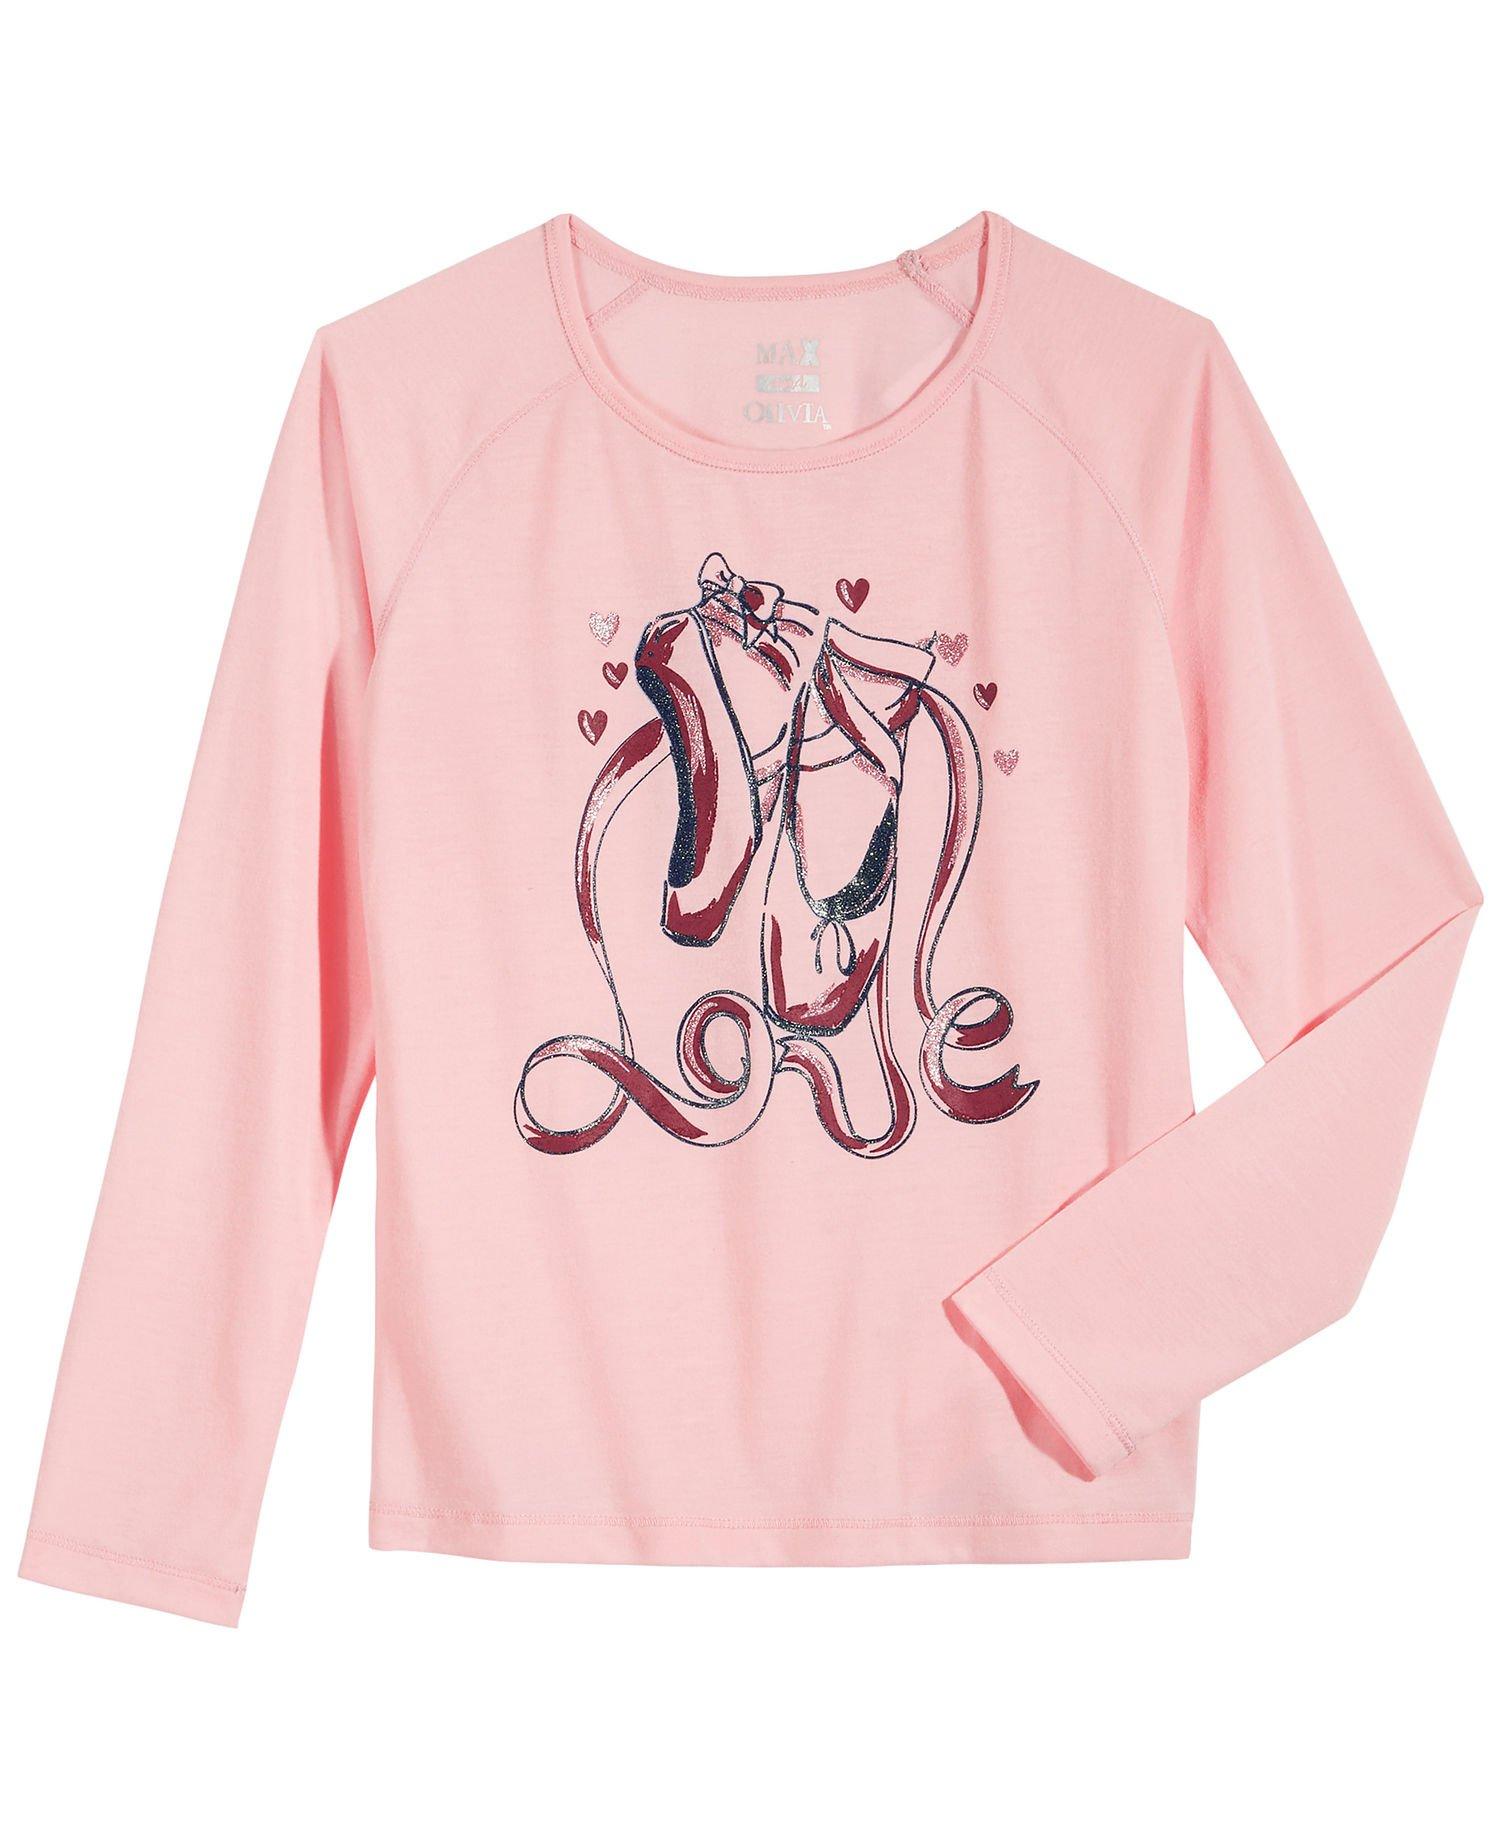 Max & Olivia Girls Polo Shirt Golf (Large, Pink) by Max & Olivia (Image #1)